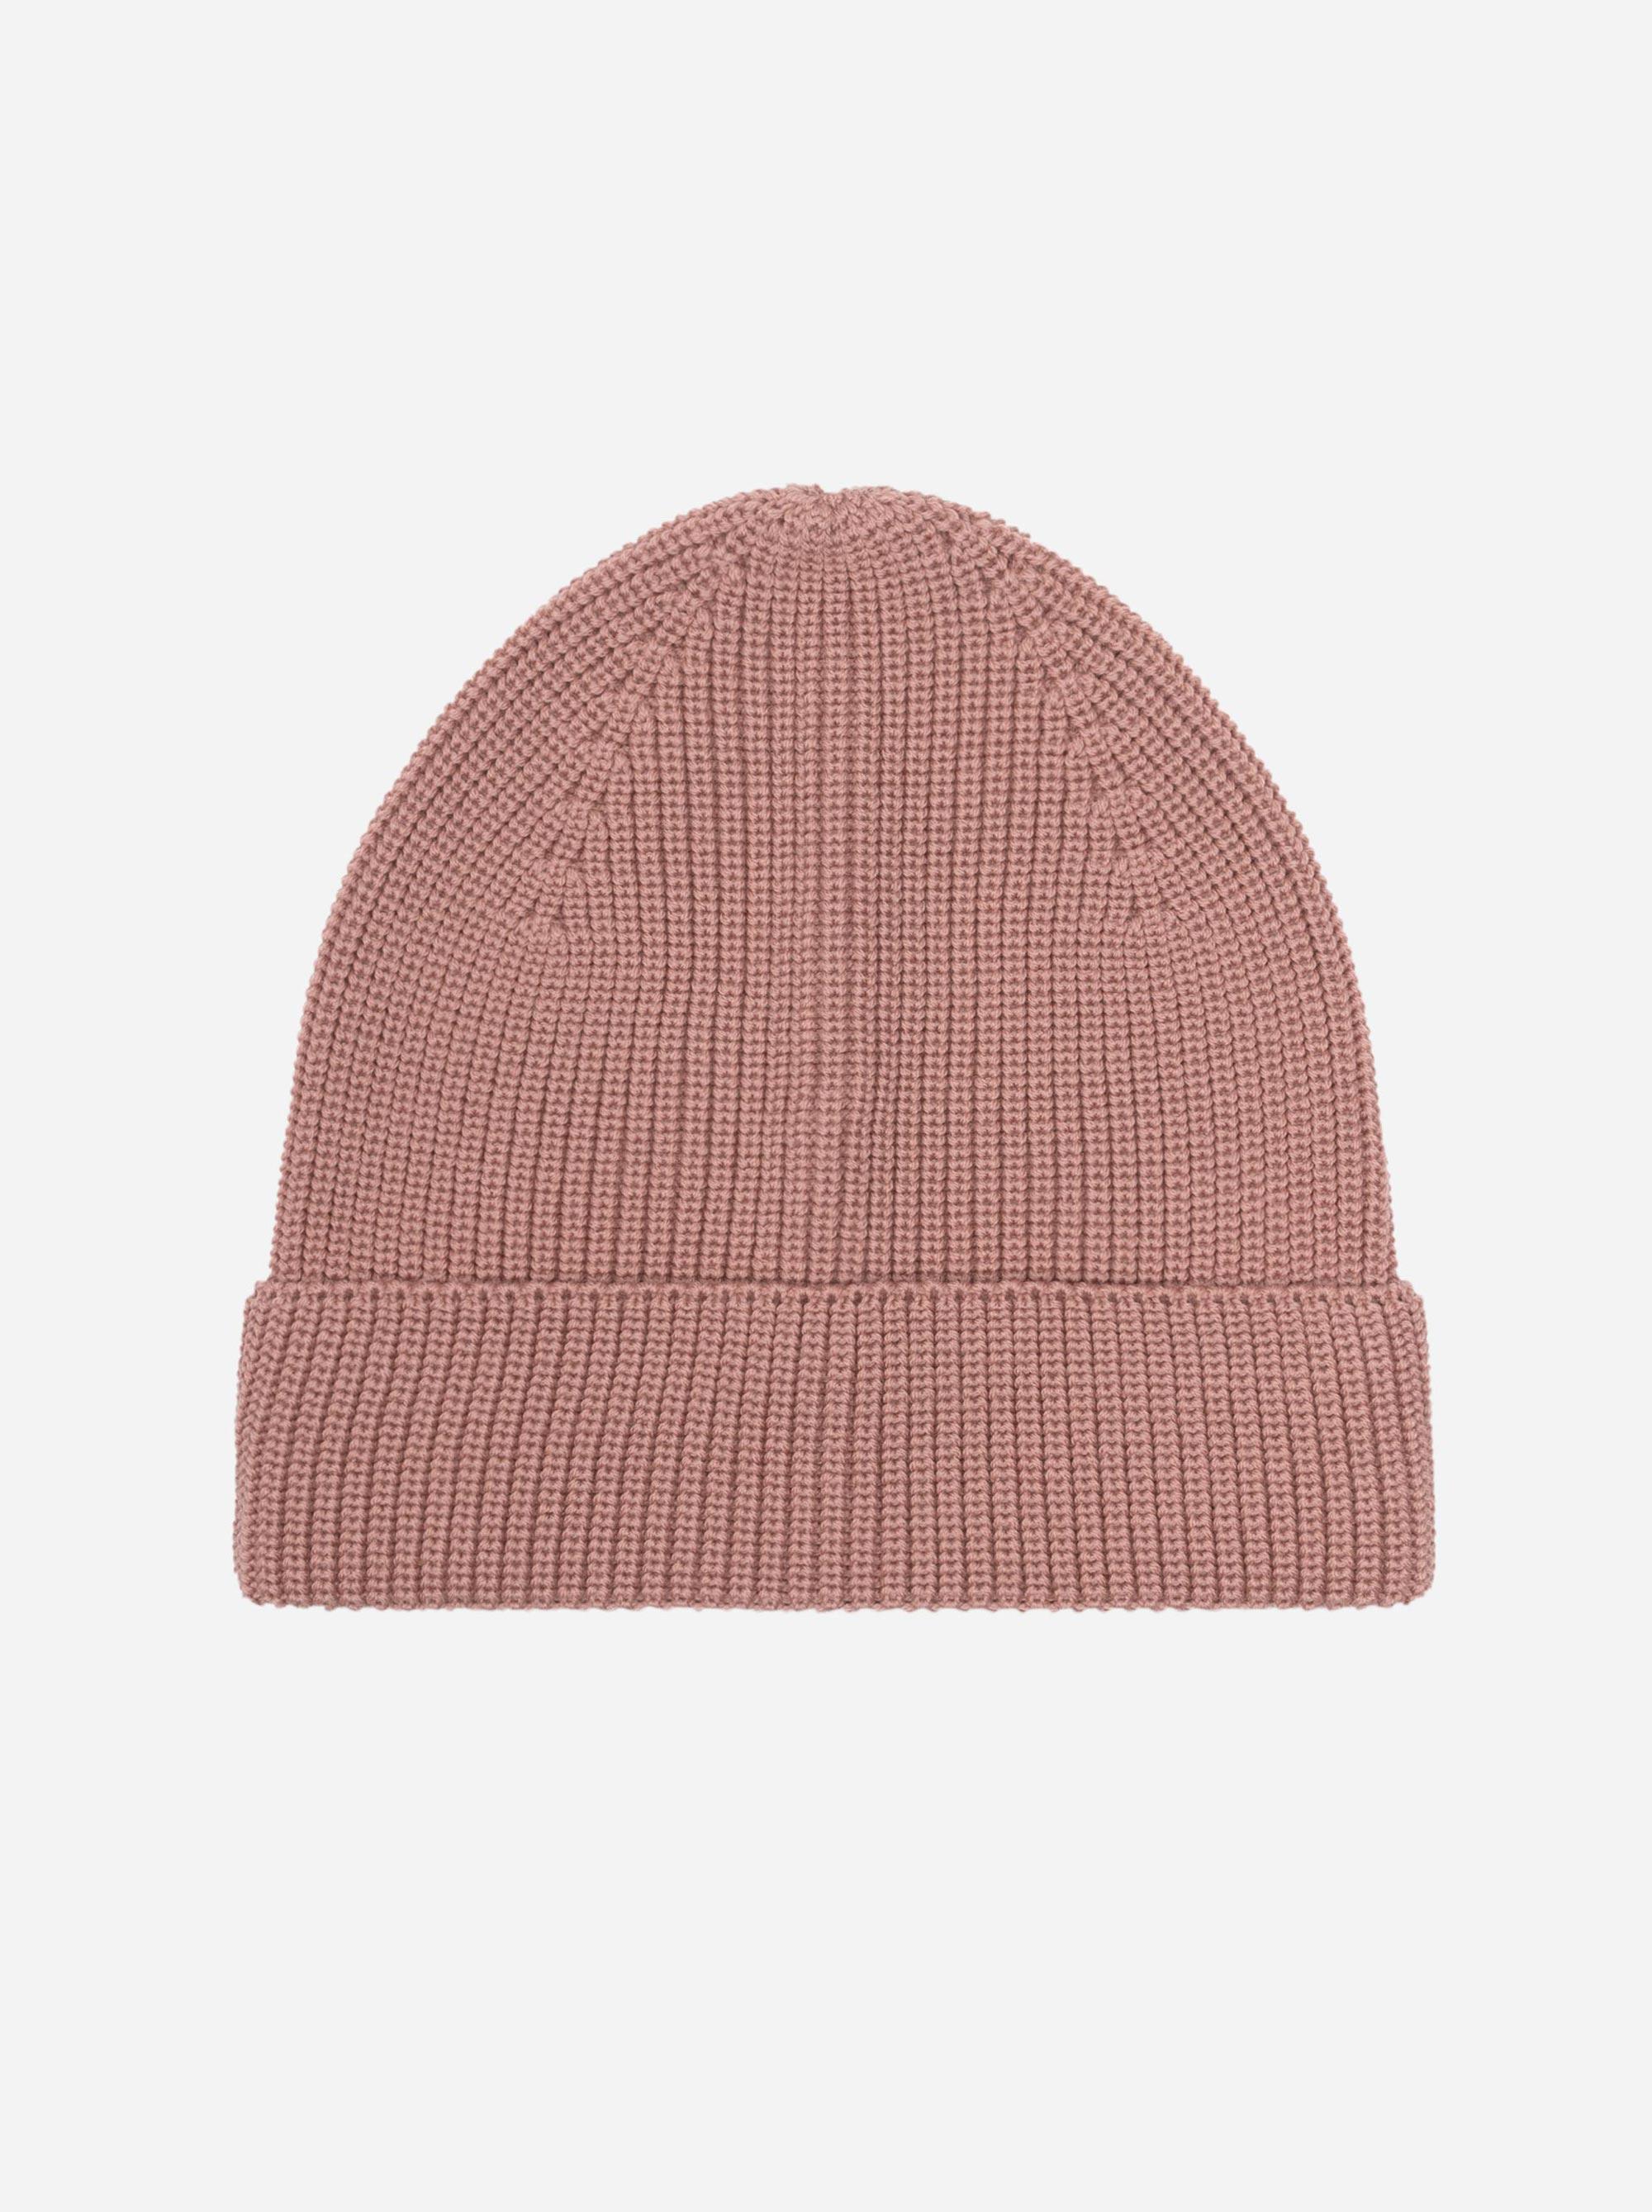 Teym - The Beanie - Pink